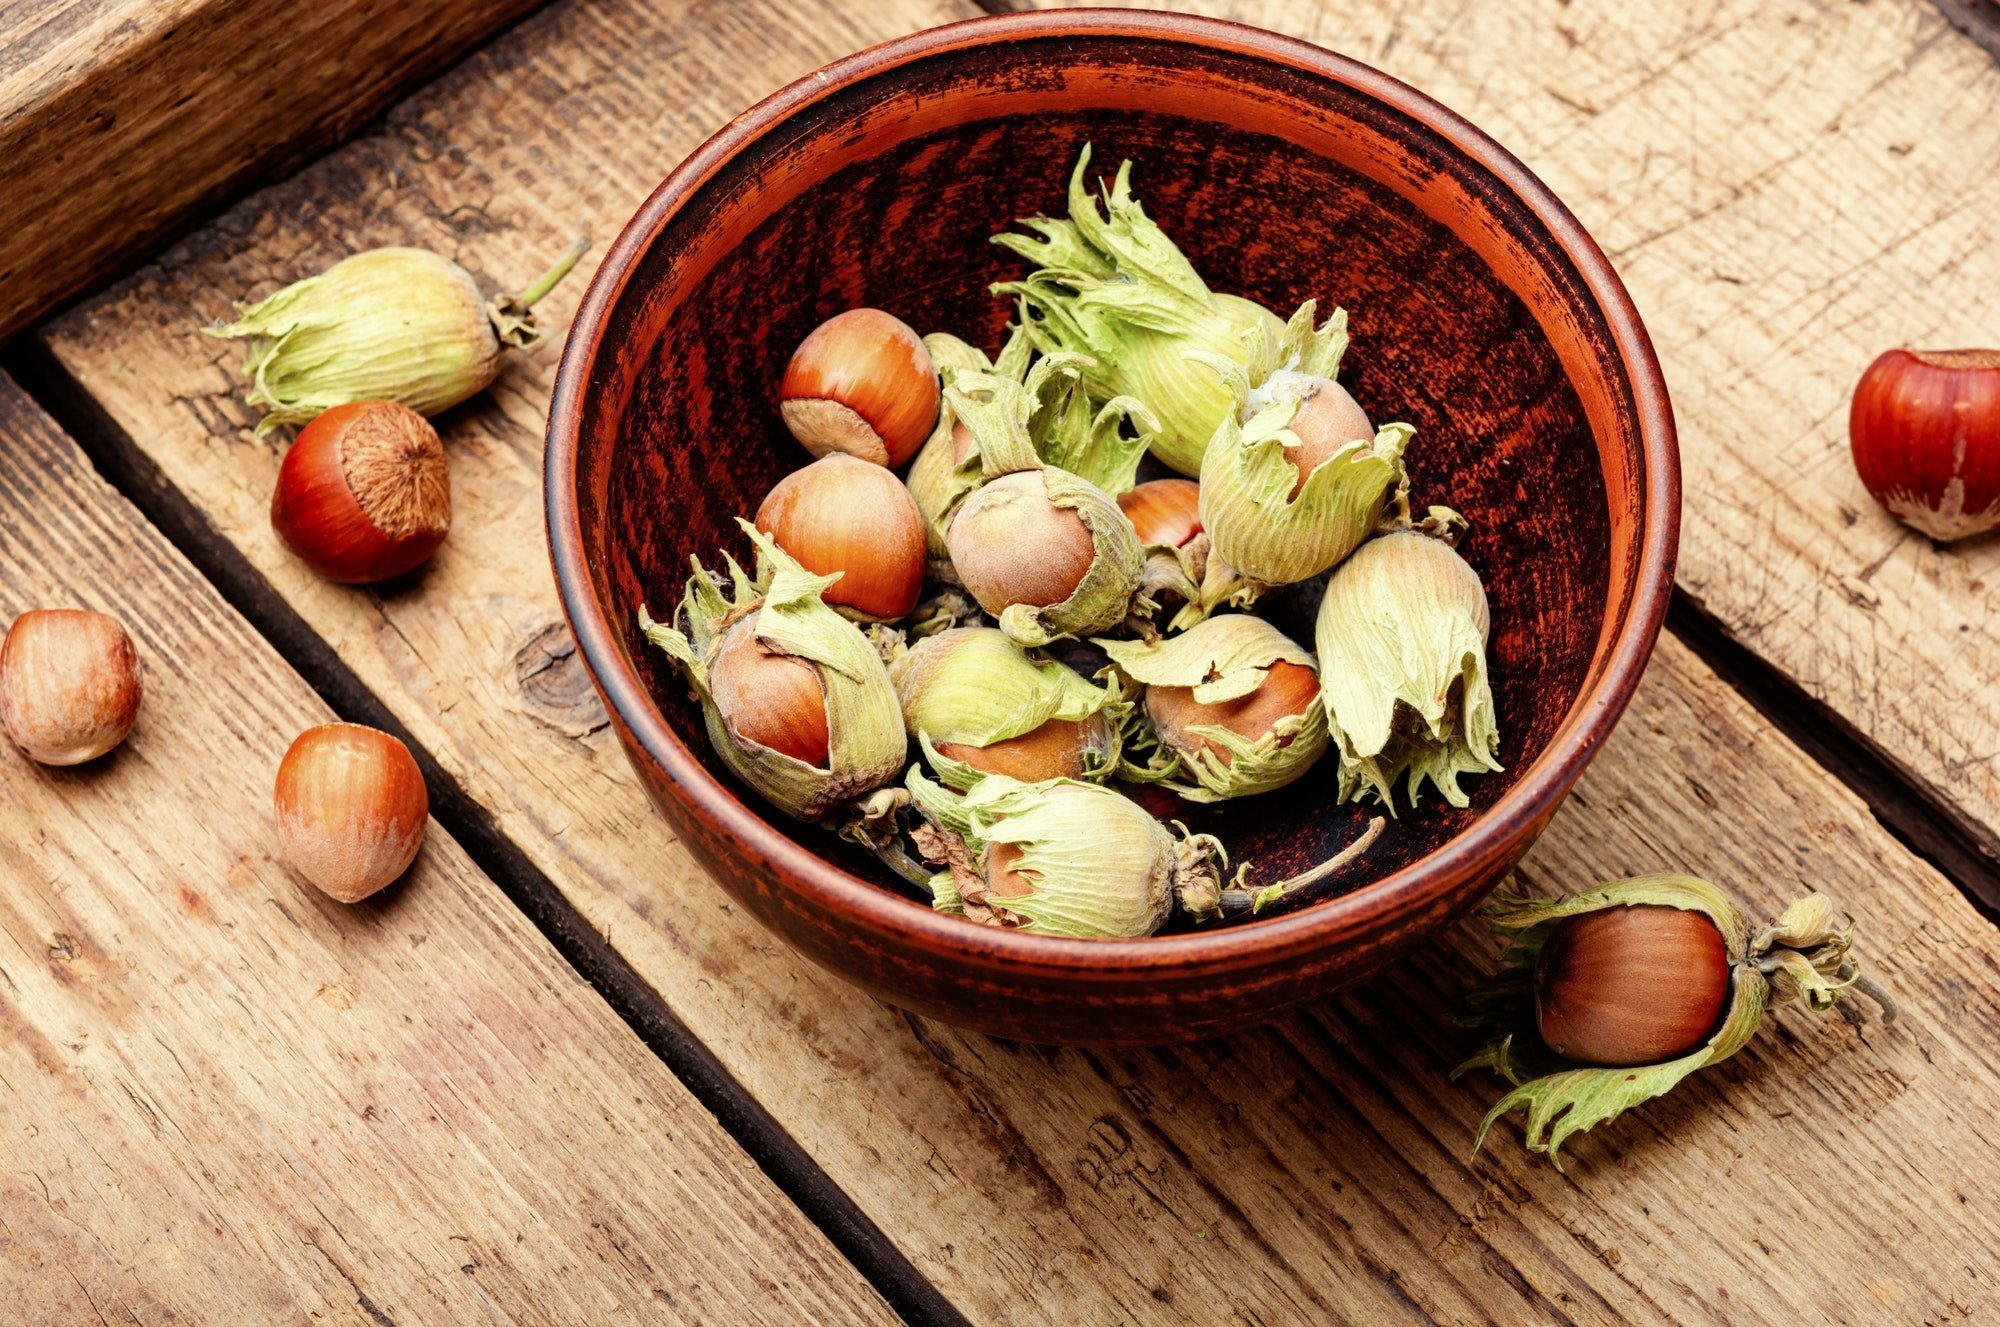 Hazelnuts or filbert